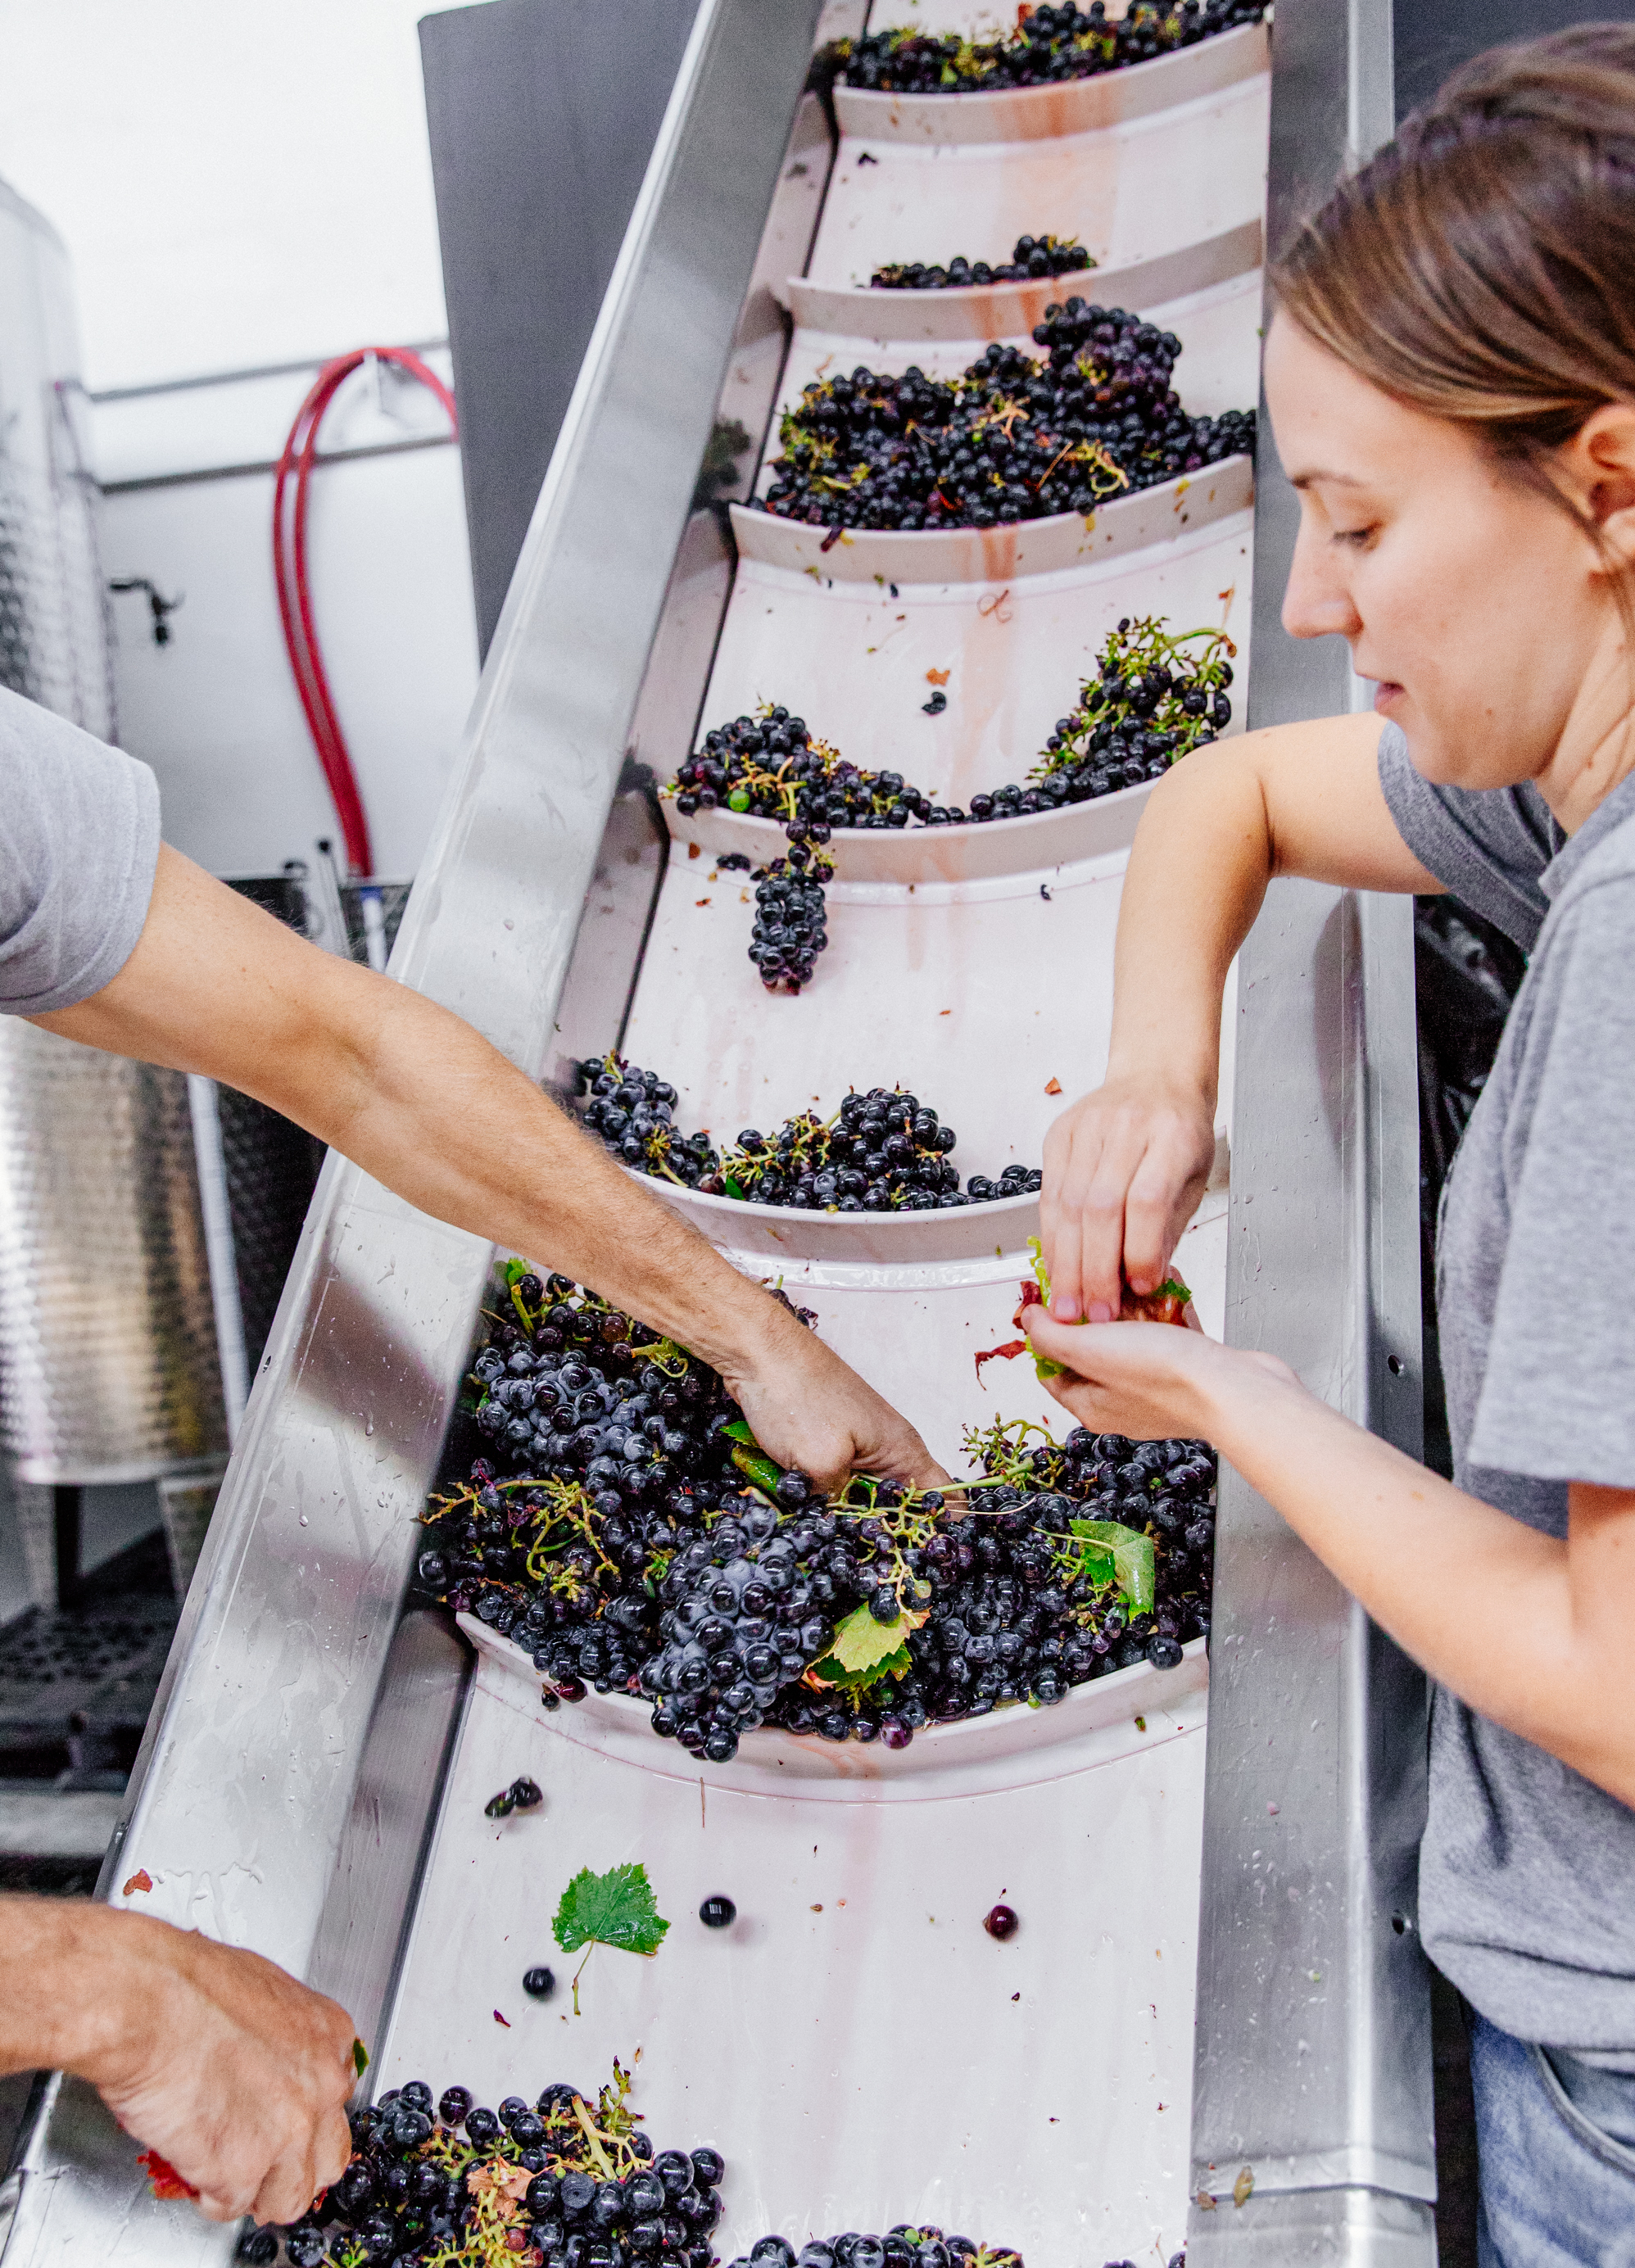 sorting-grape-leaves-urban-winery-good-eggs-edit.jpg